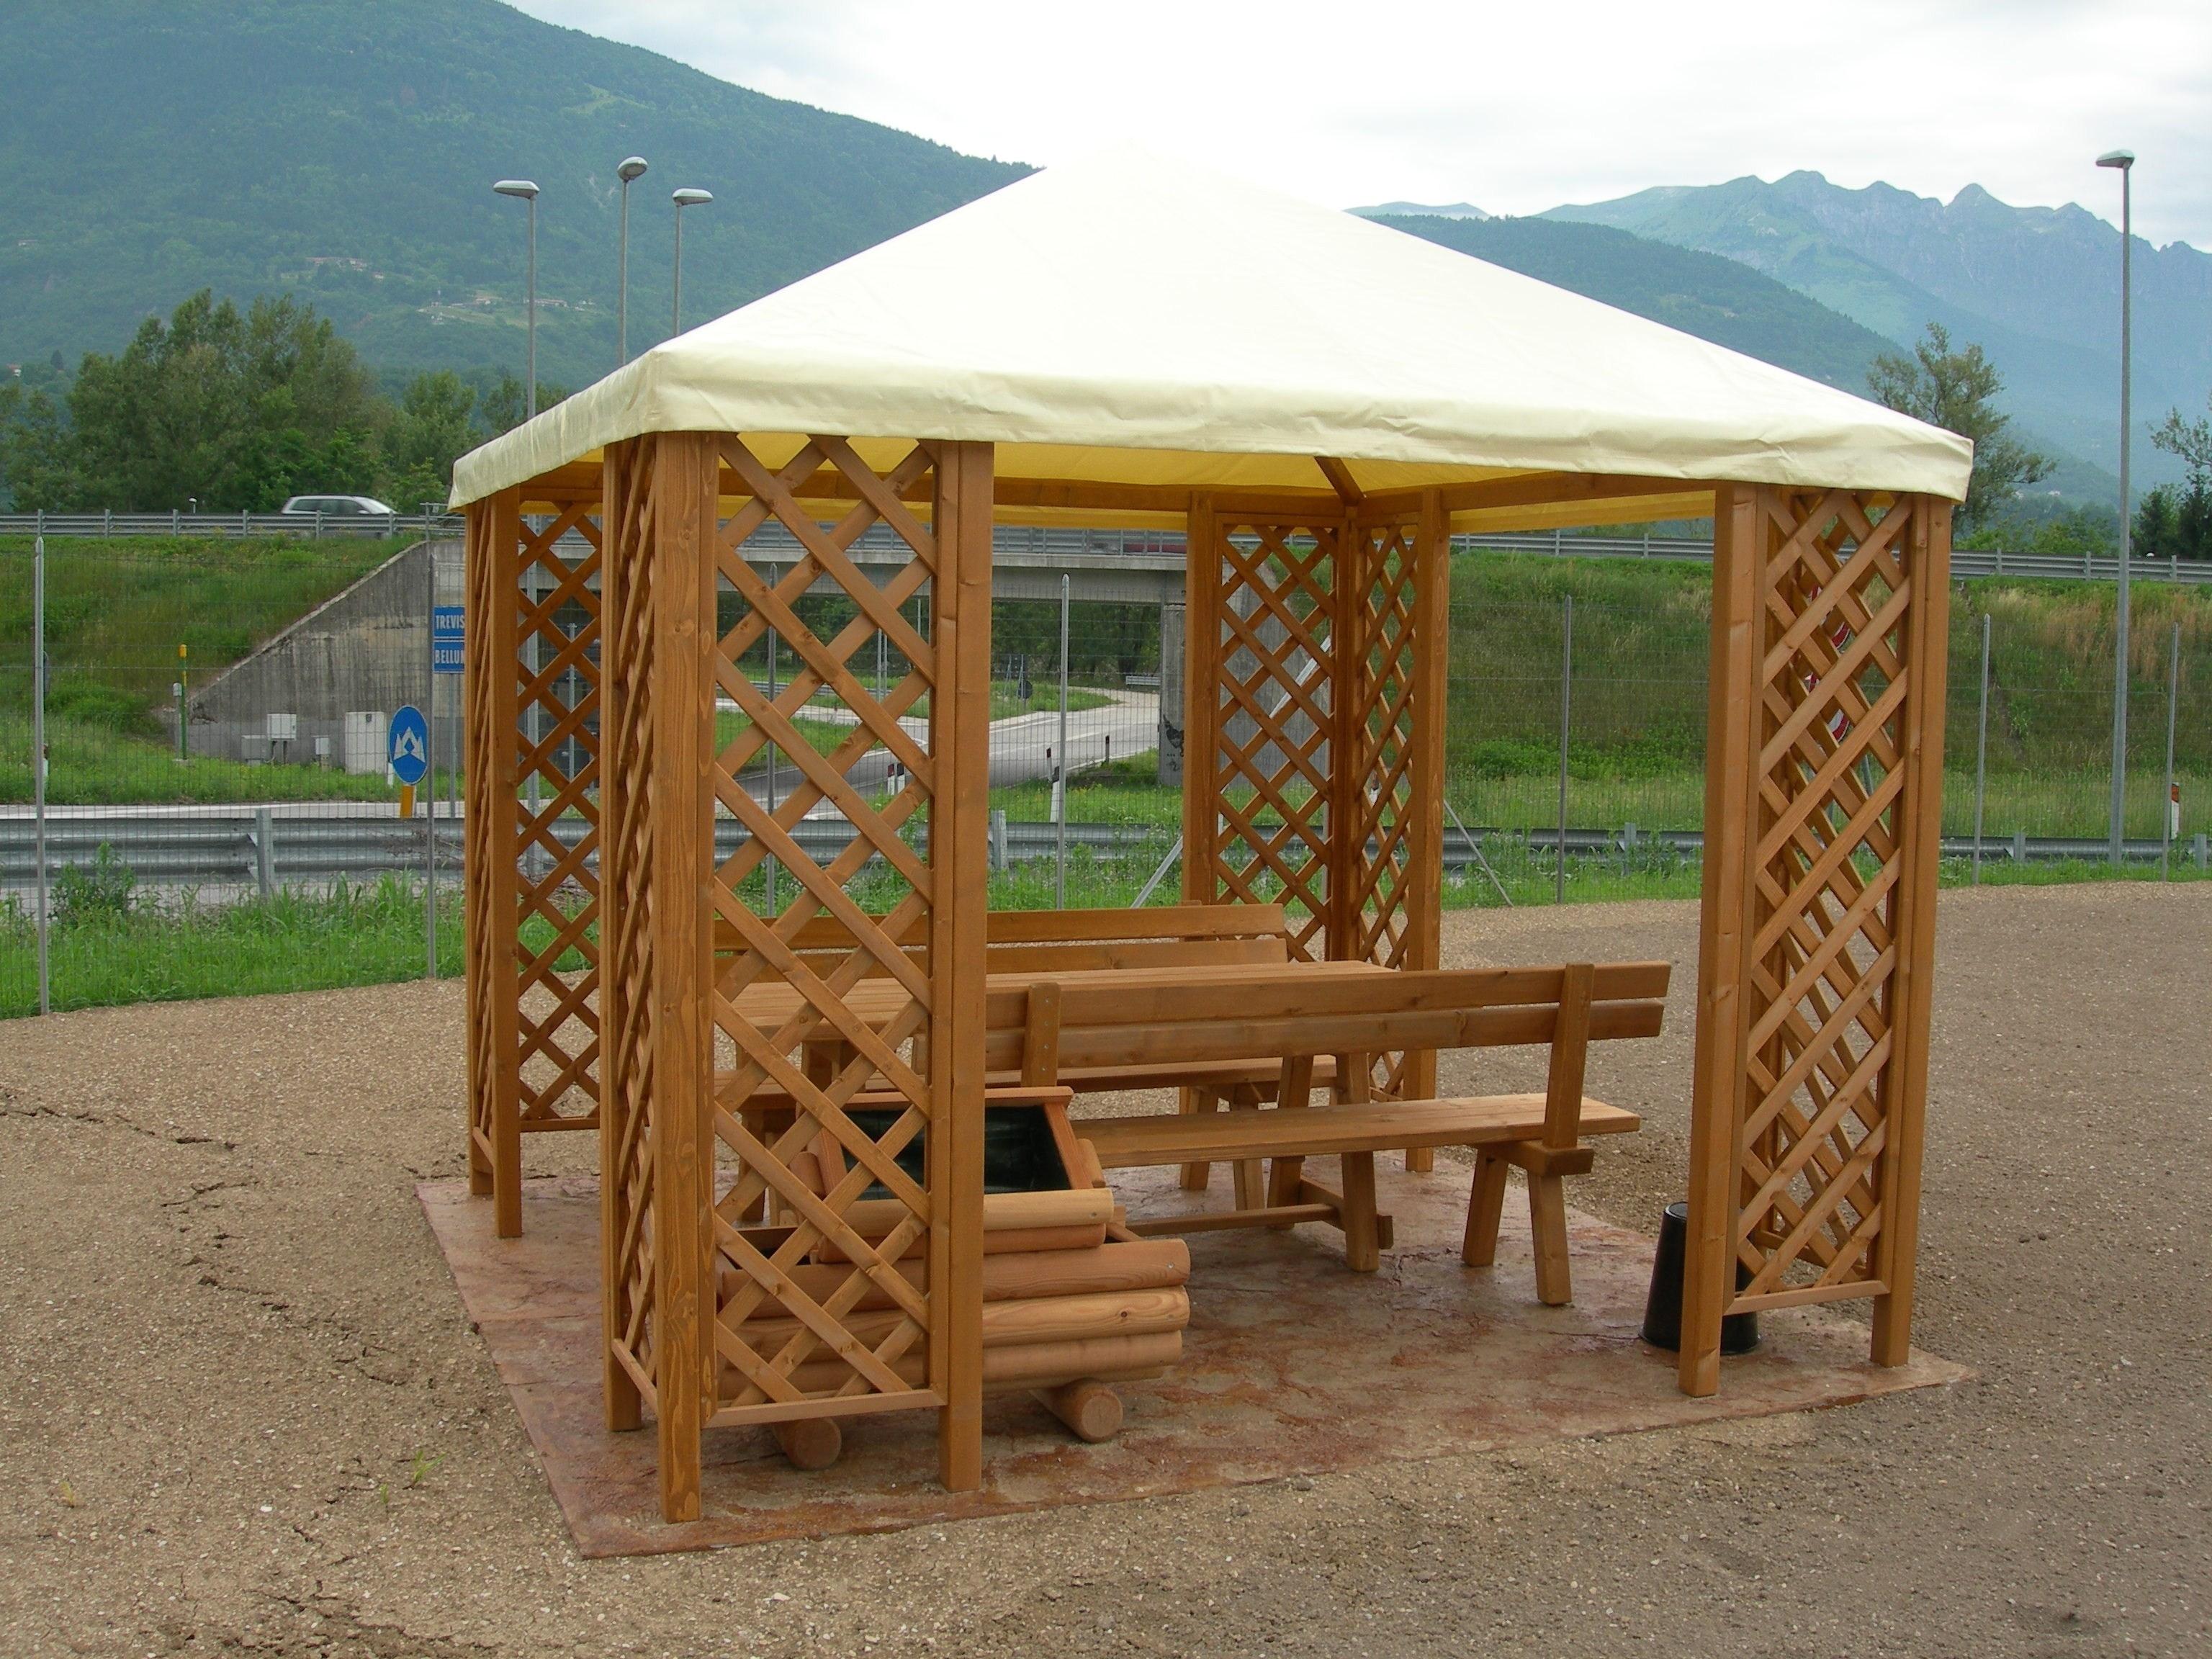 Gazebo in legno da giardino gazebo gabezo per giardino for Arredo per giardino in legno